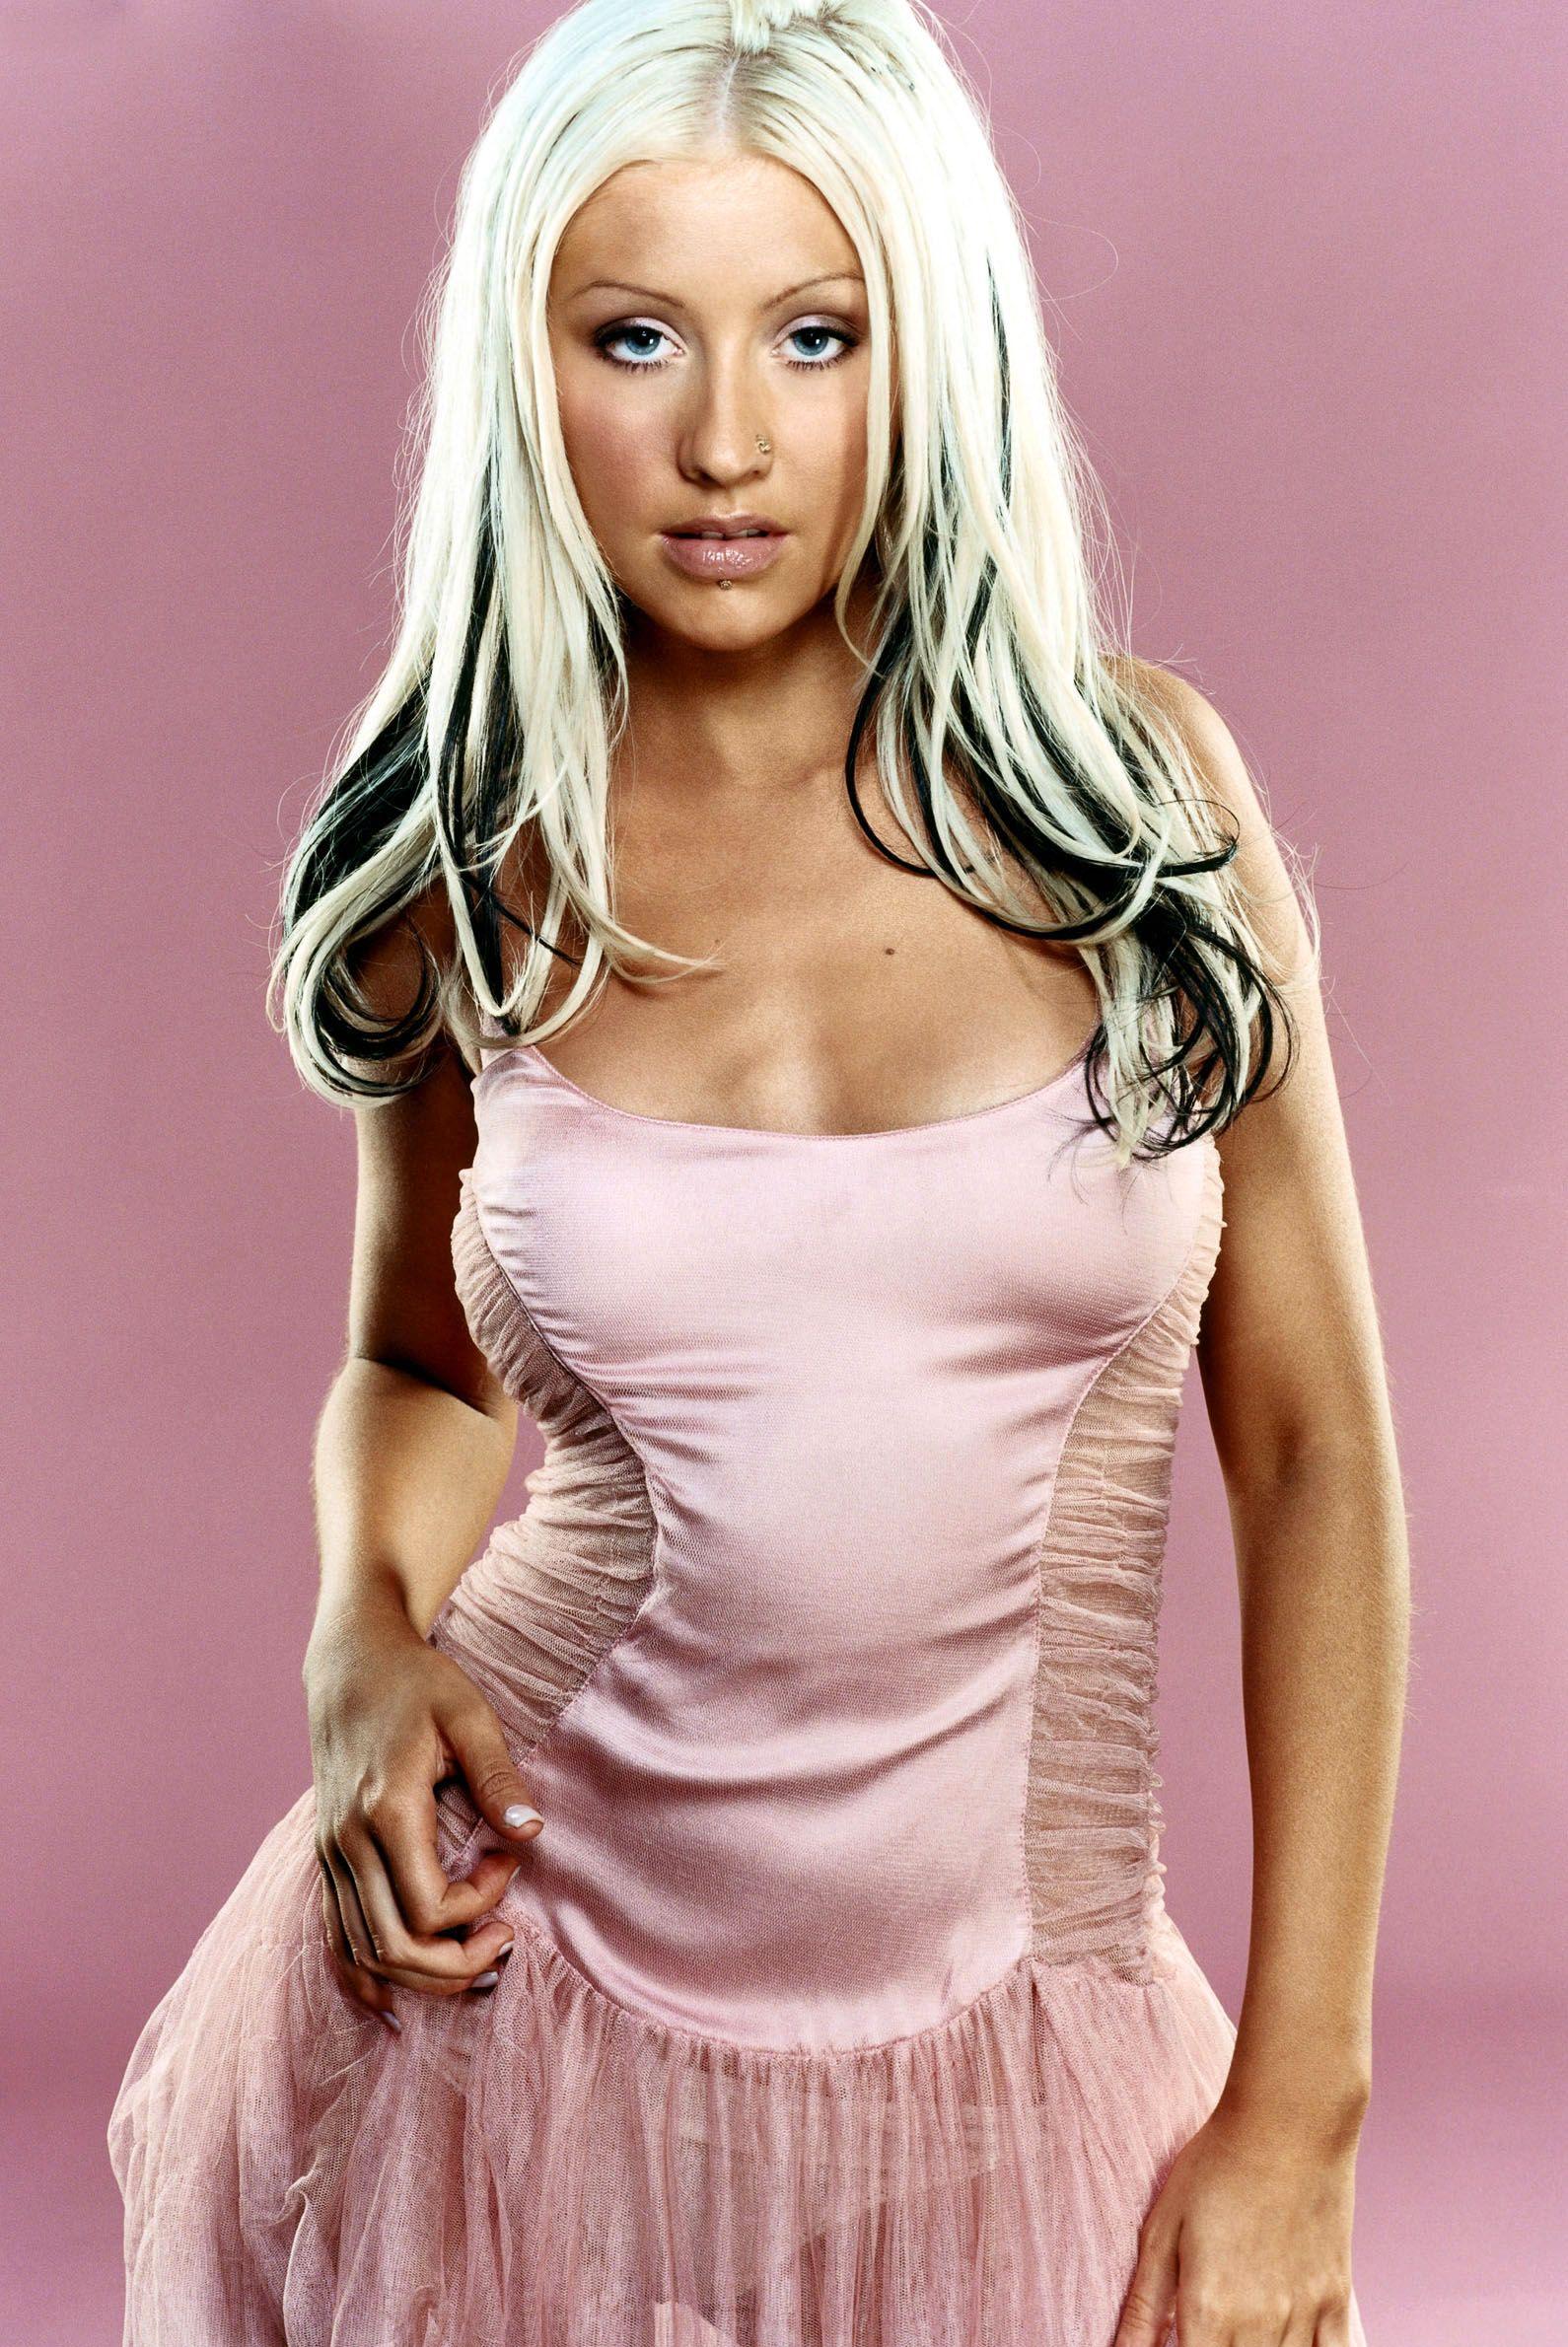 Christina Aguilera Mark Abrahams 2003